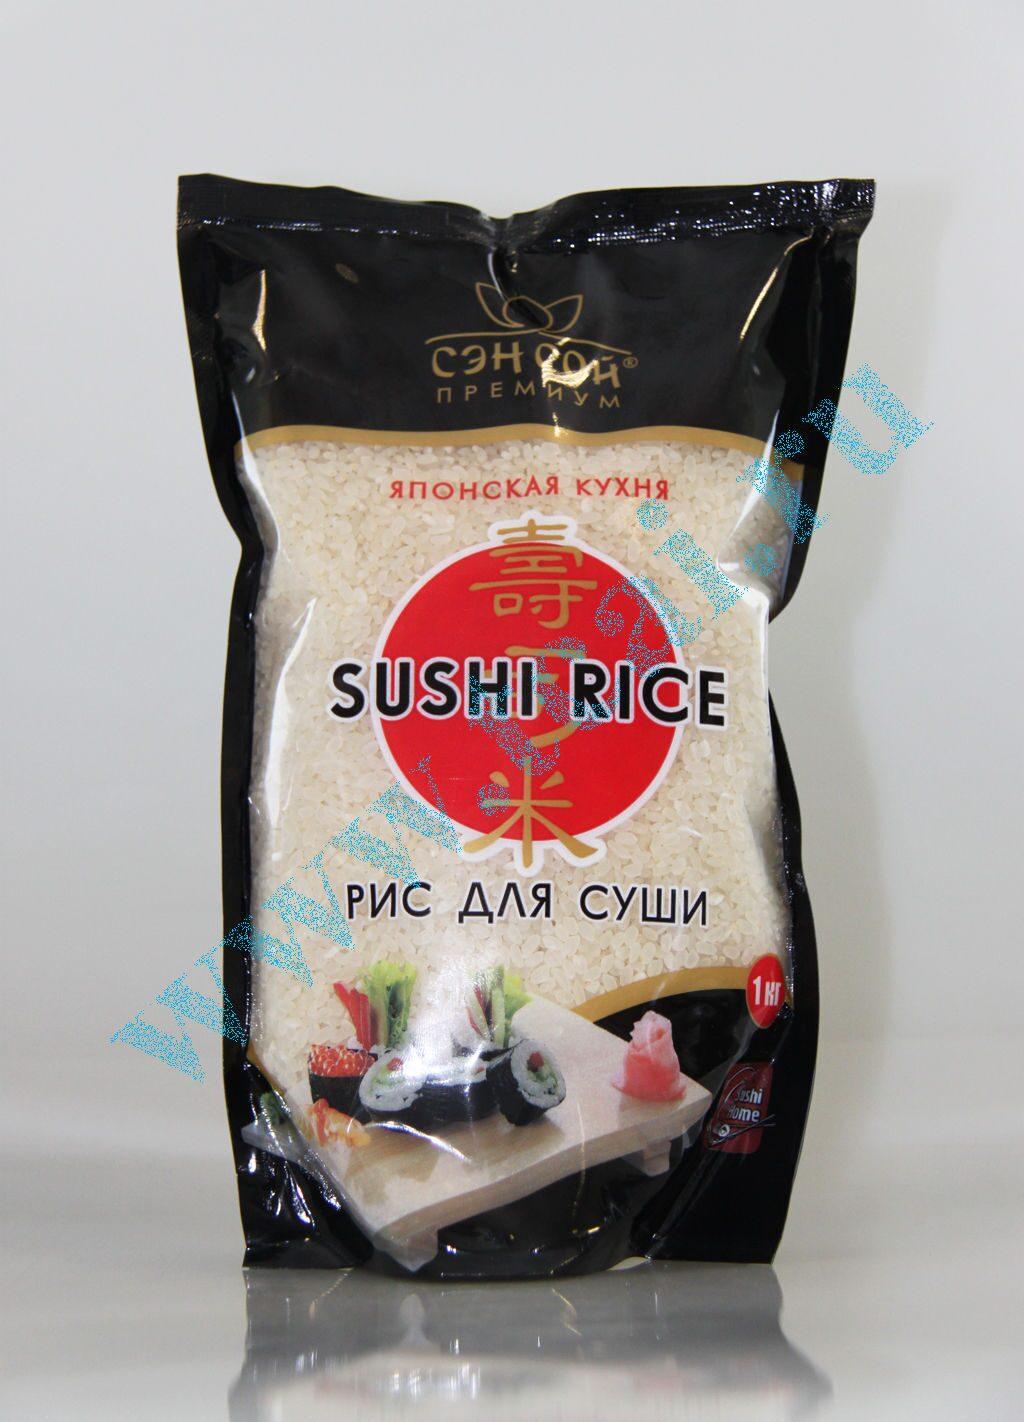 Рис для роллов своими руками